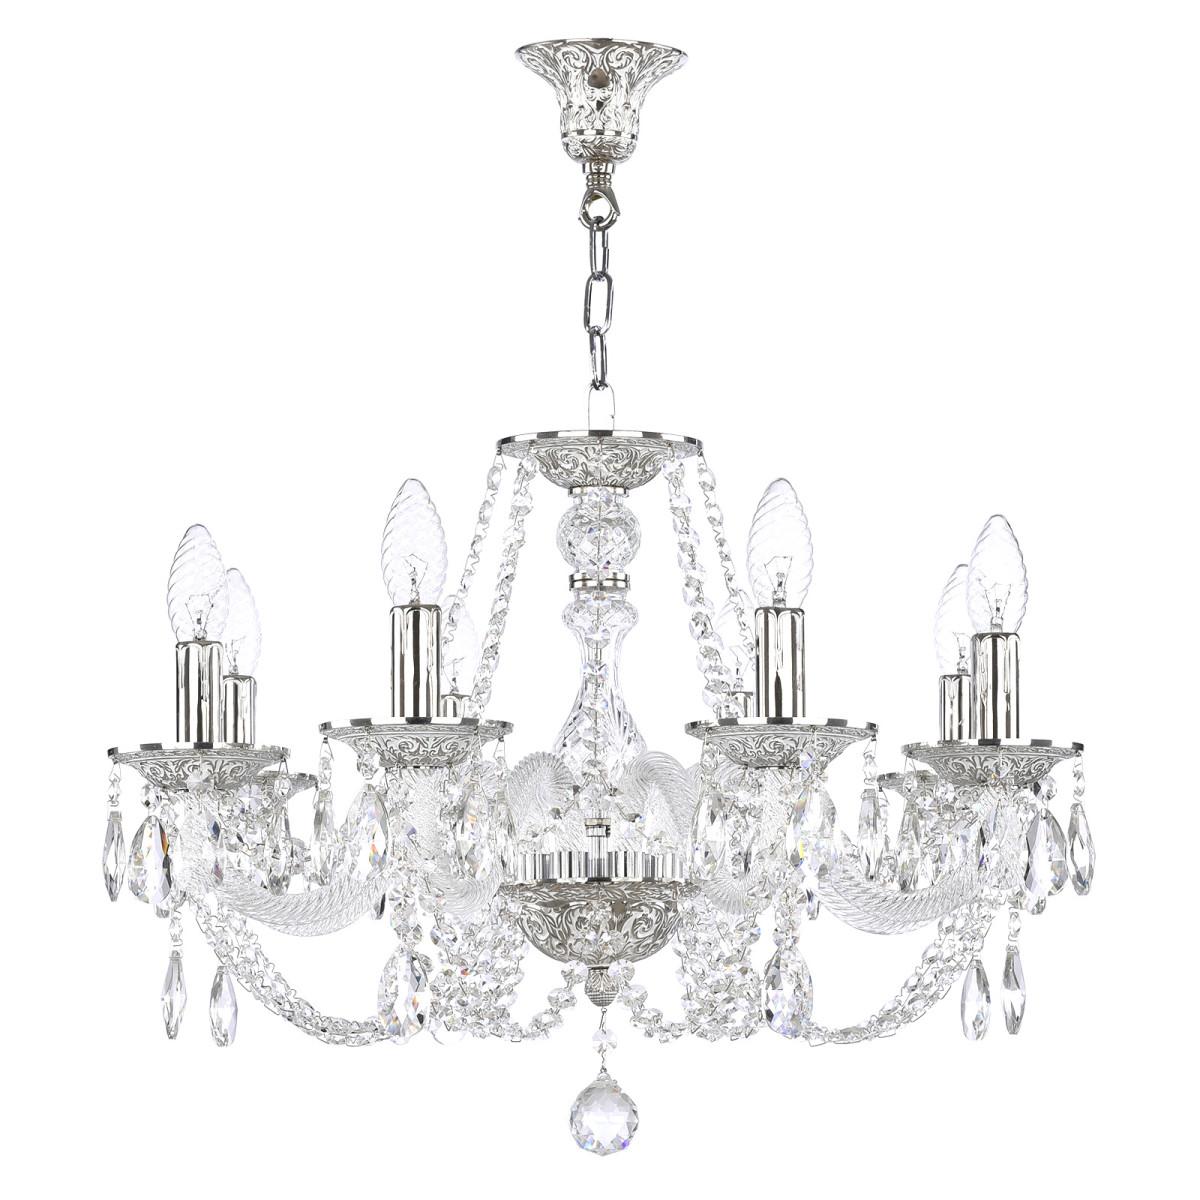 Люстра Bohemia Ivele Crystal 1602 1601.8.195.Ni E14 8 ламп 16 м²